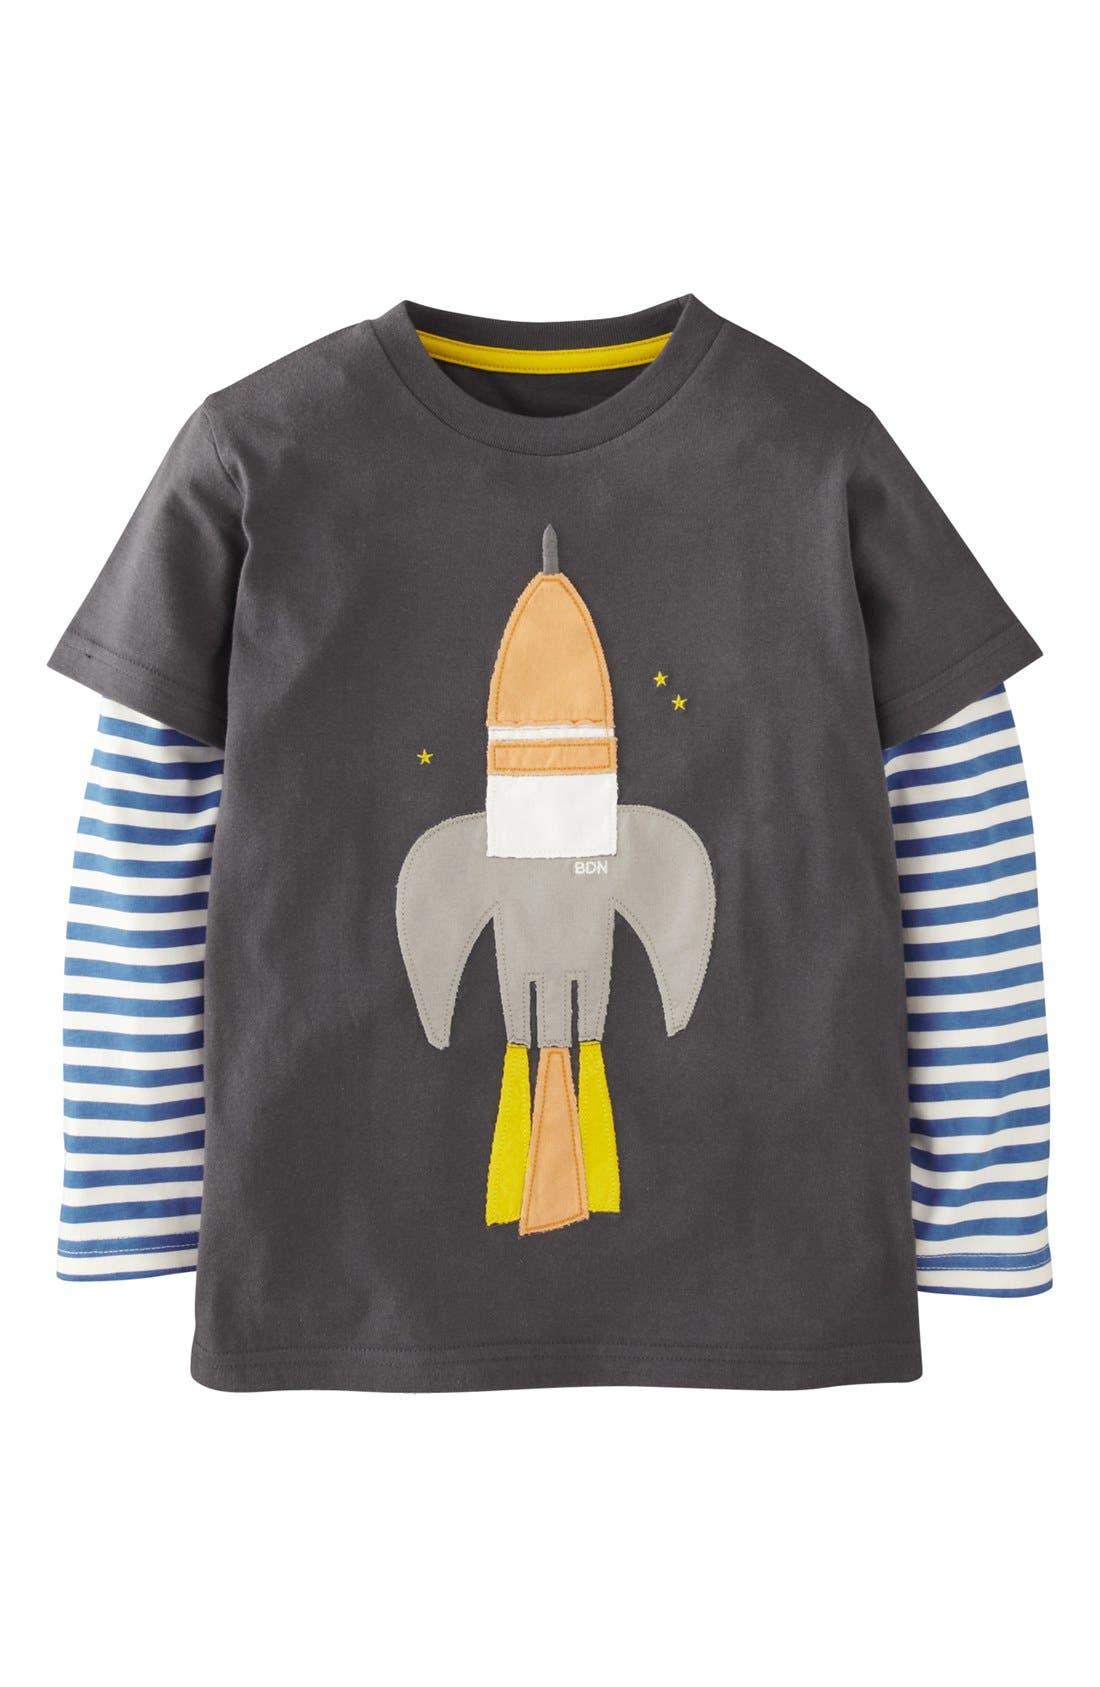 Alternate Image 1 Selected - Mini Boden 'Big Vehicle' Appliqué Layered Sleeve T-Shirt (Toddler Boys, Little Boys & Big Boys)